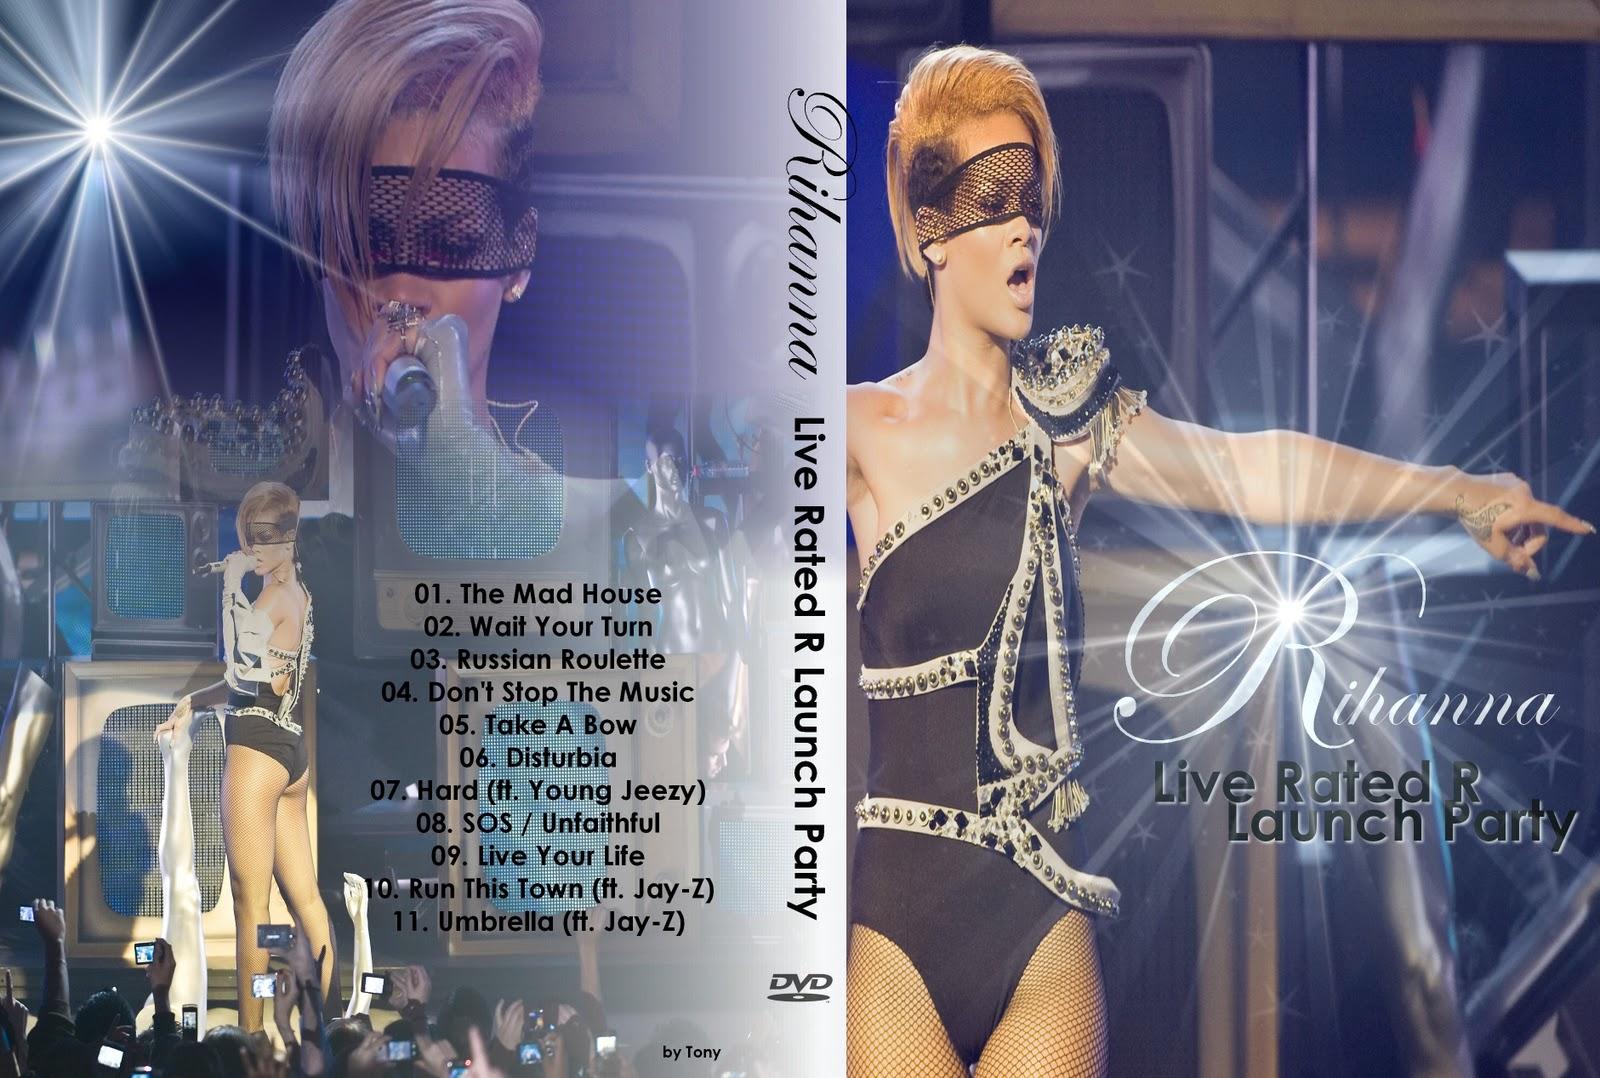 http://1.bp.blogspot.com/-c8SHxaljTas/UGiKfh2zWNI/AAAAAAAABC0/34ftEt0m8b0/s1600/Rihanna+Rated+R+2.jpg